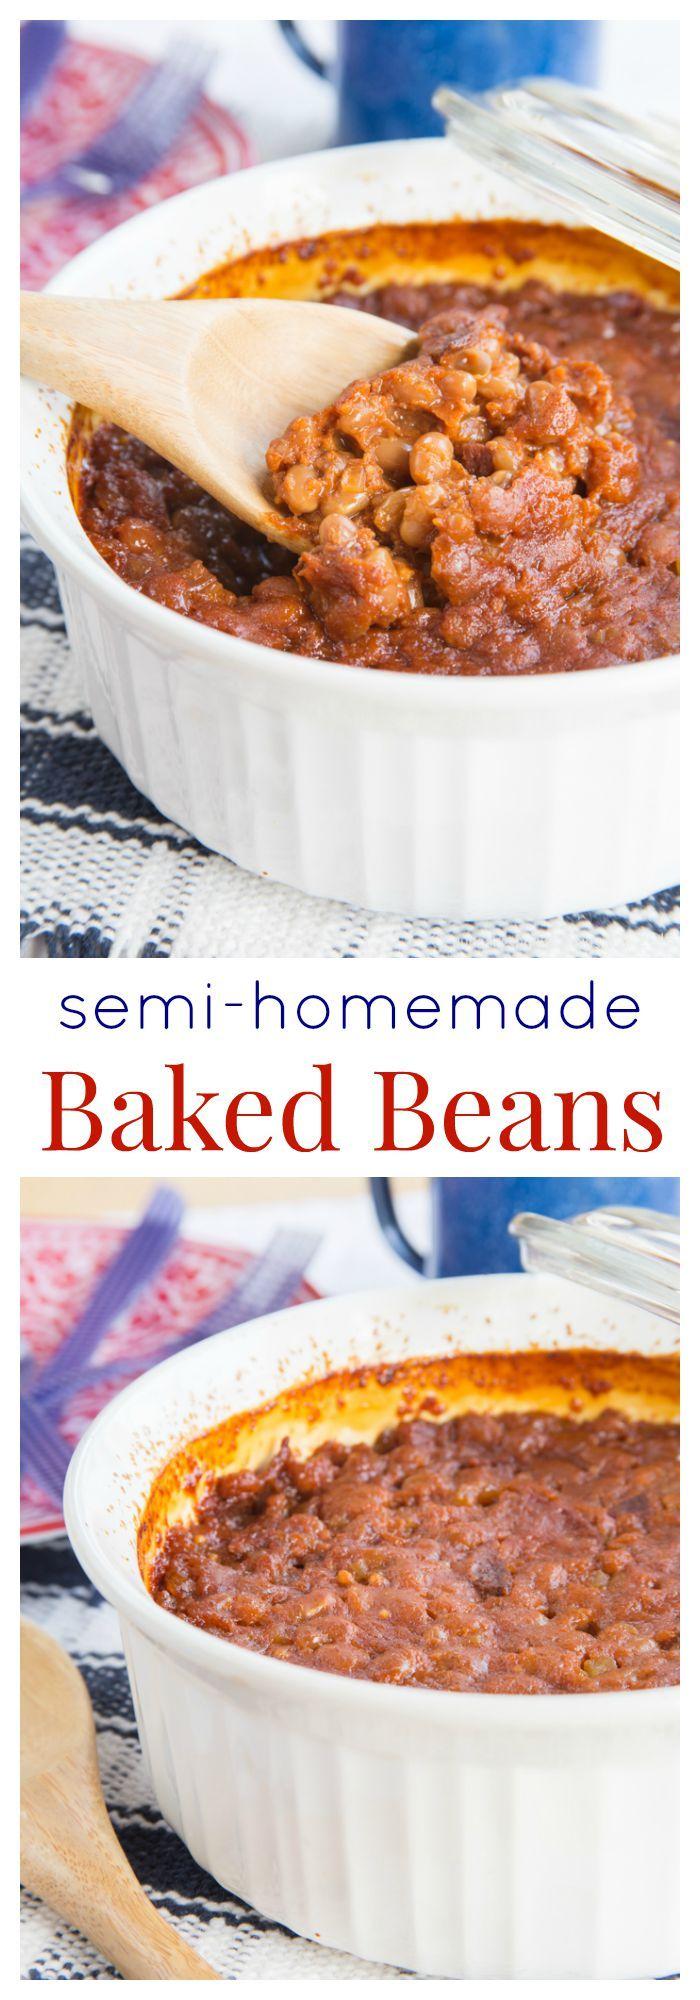 baked beans american style baked beans allrecipes co uk crockpot baked ...